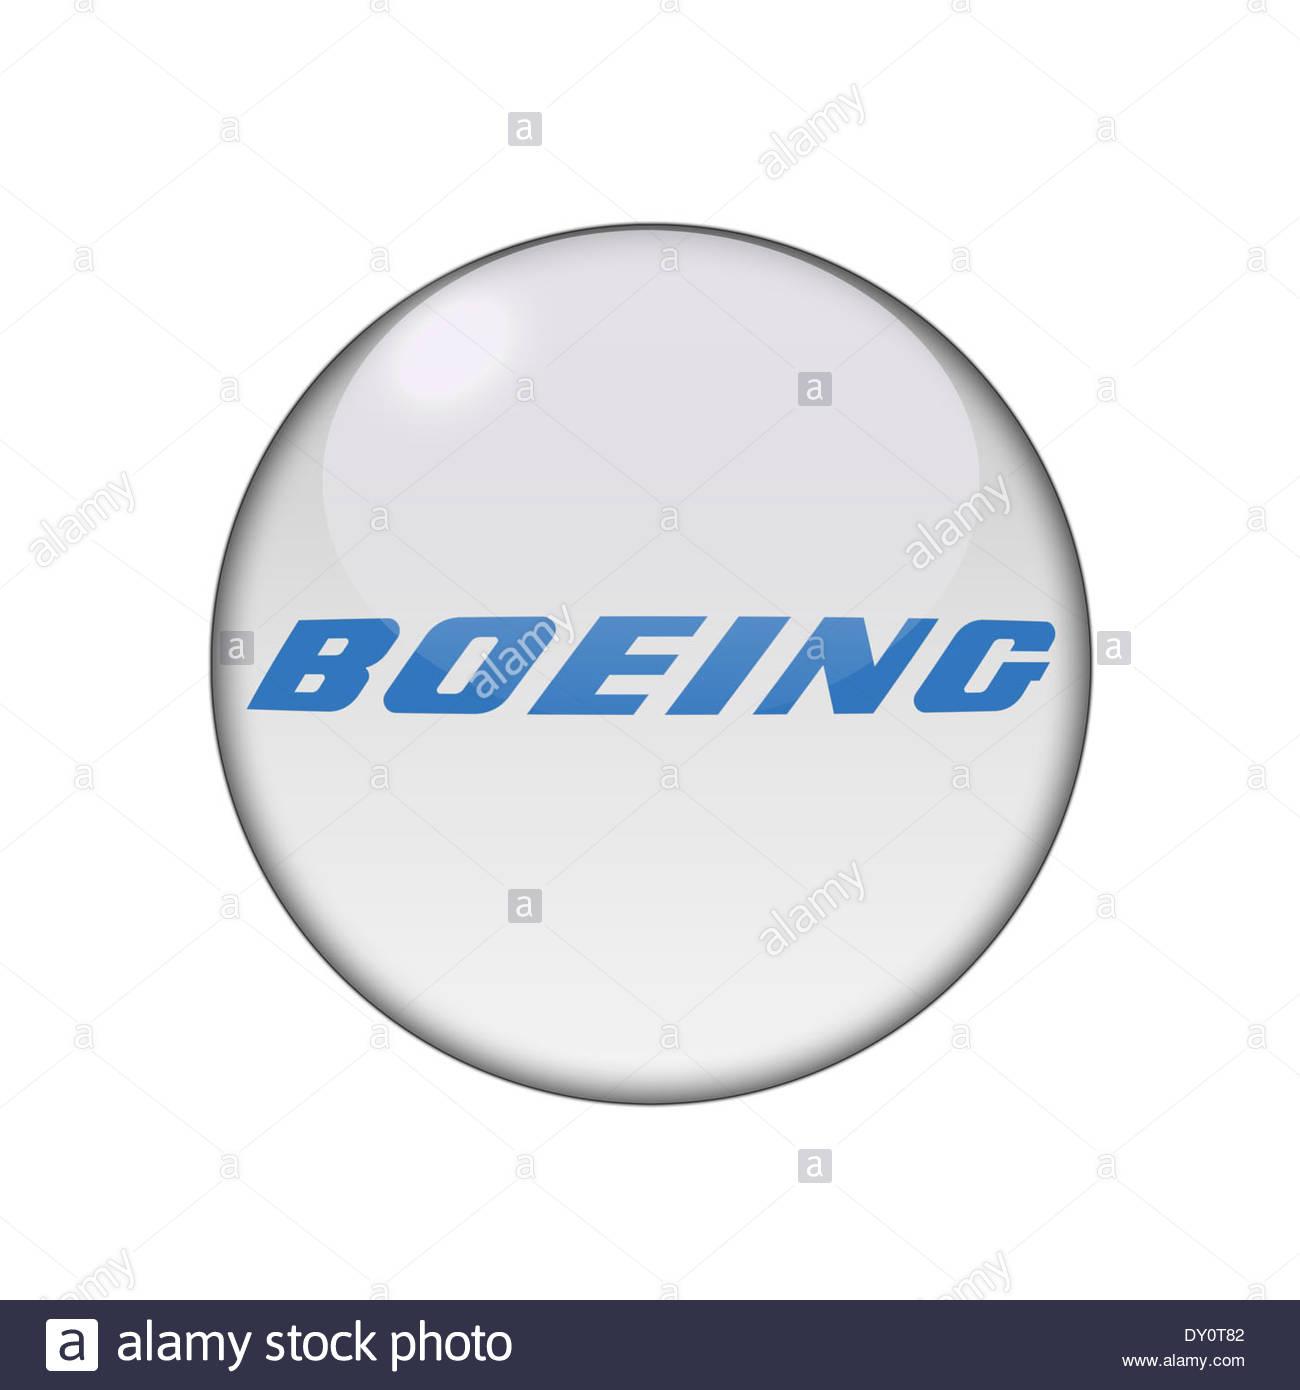 Boeing icon logo stock photo 68245858 alamy boeing icon logo stock photo buycottarizona Image collections